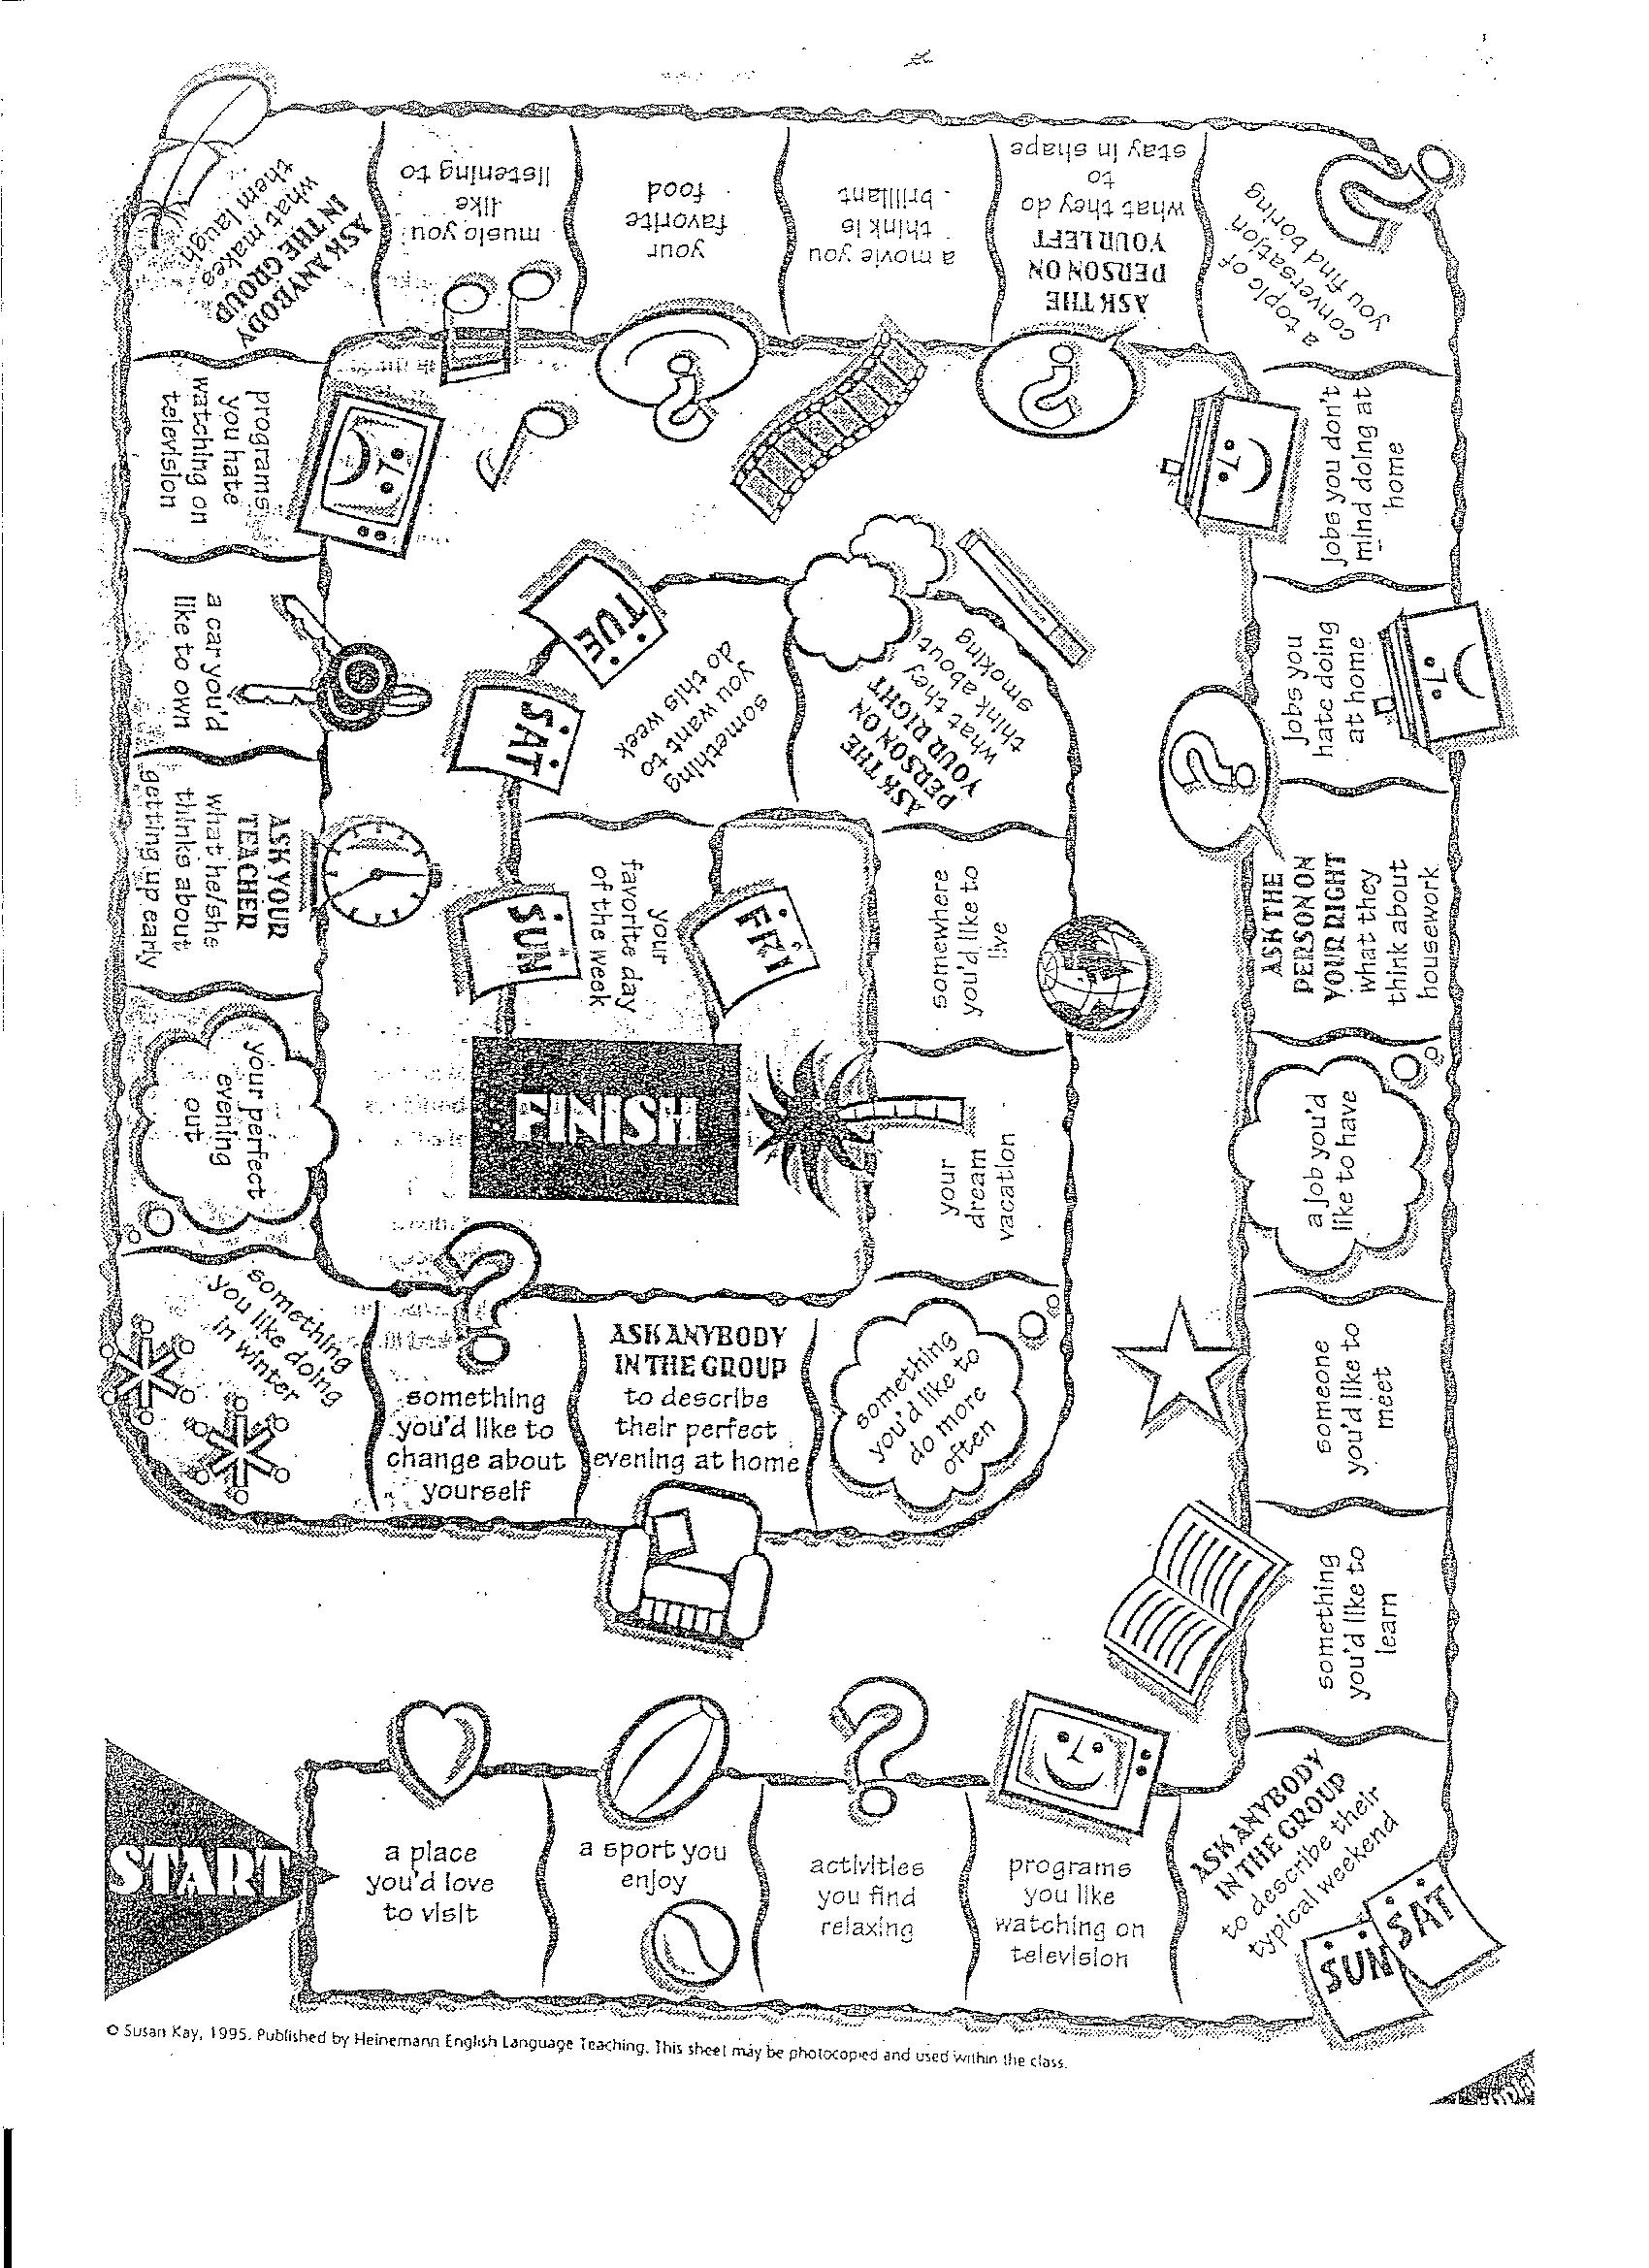 Esl Communicative Board Games Lesson Plan Materials For